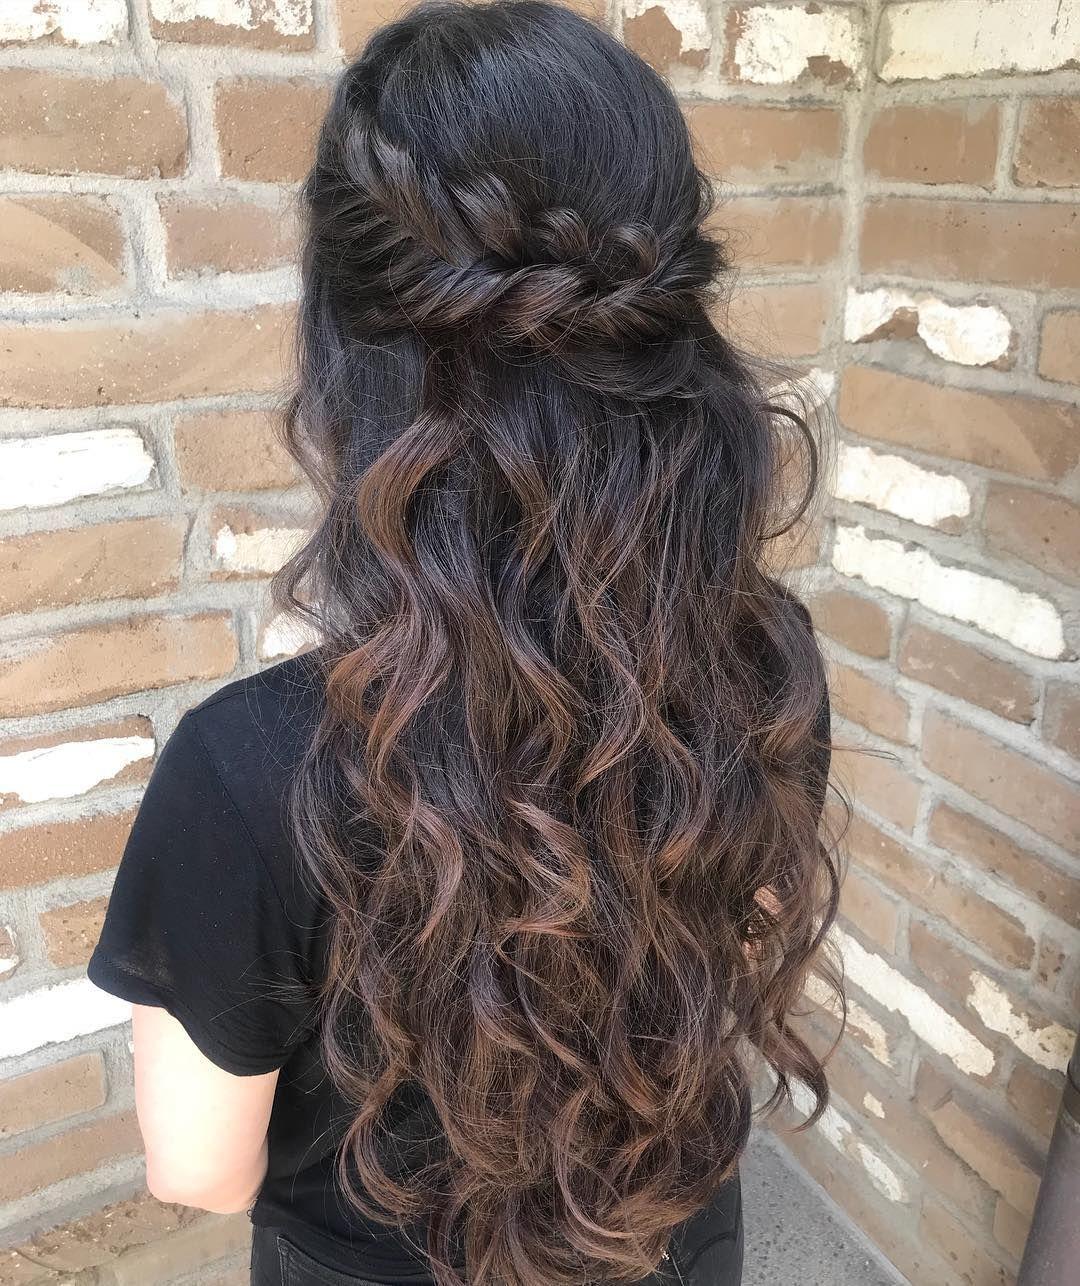 Featured Hair by Savanna